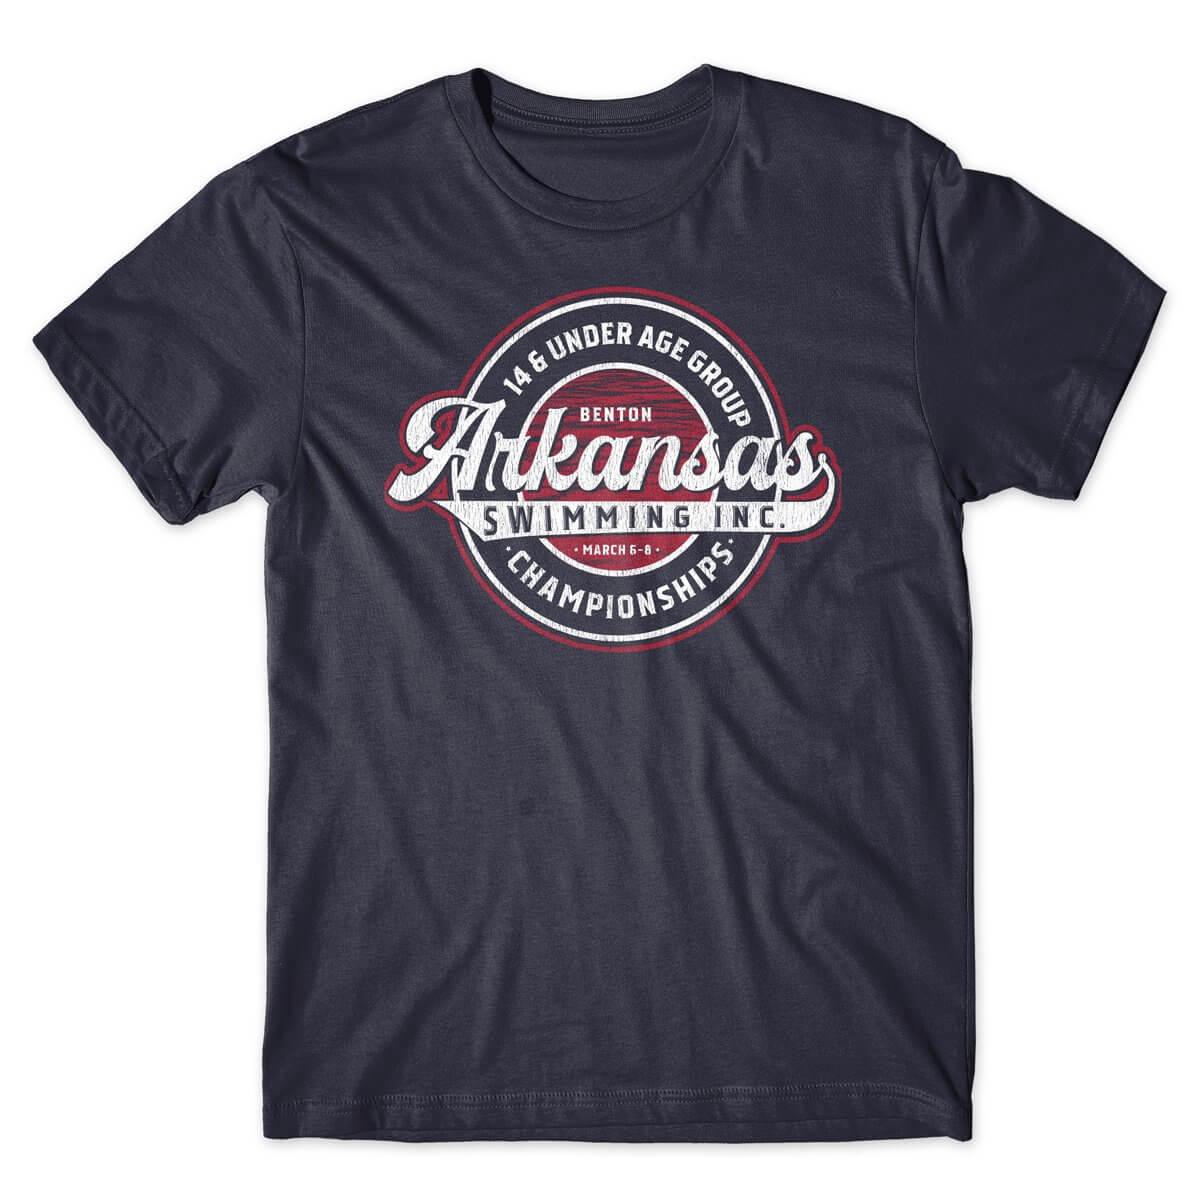 Arkansas Swimming Championships t-shirt design